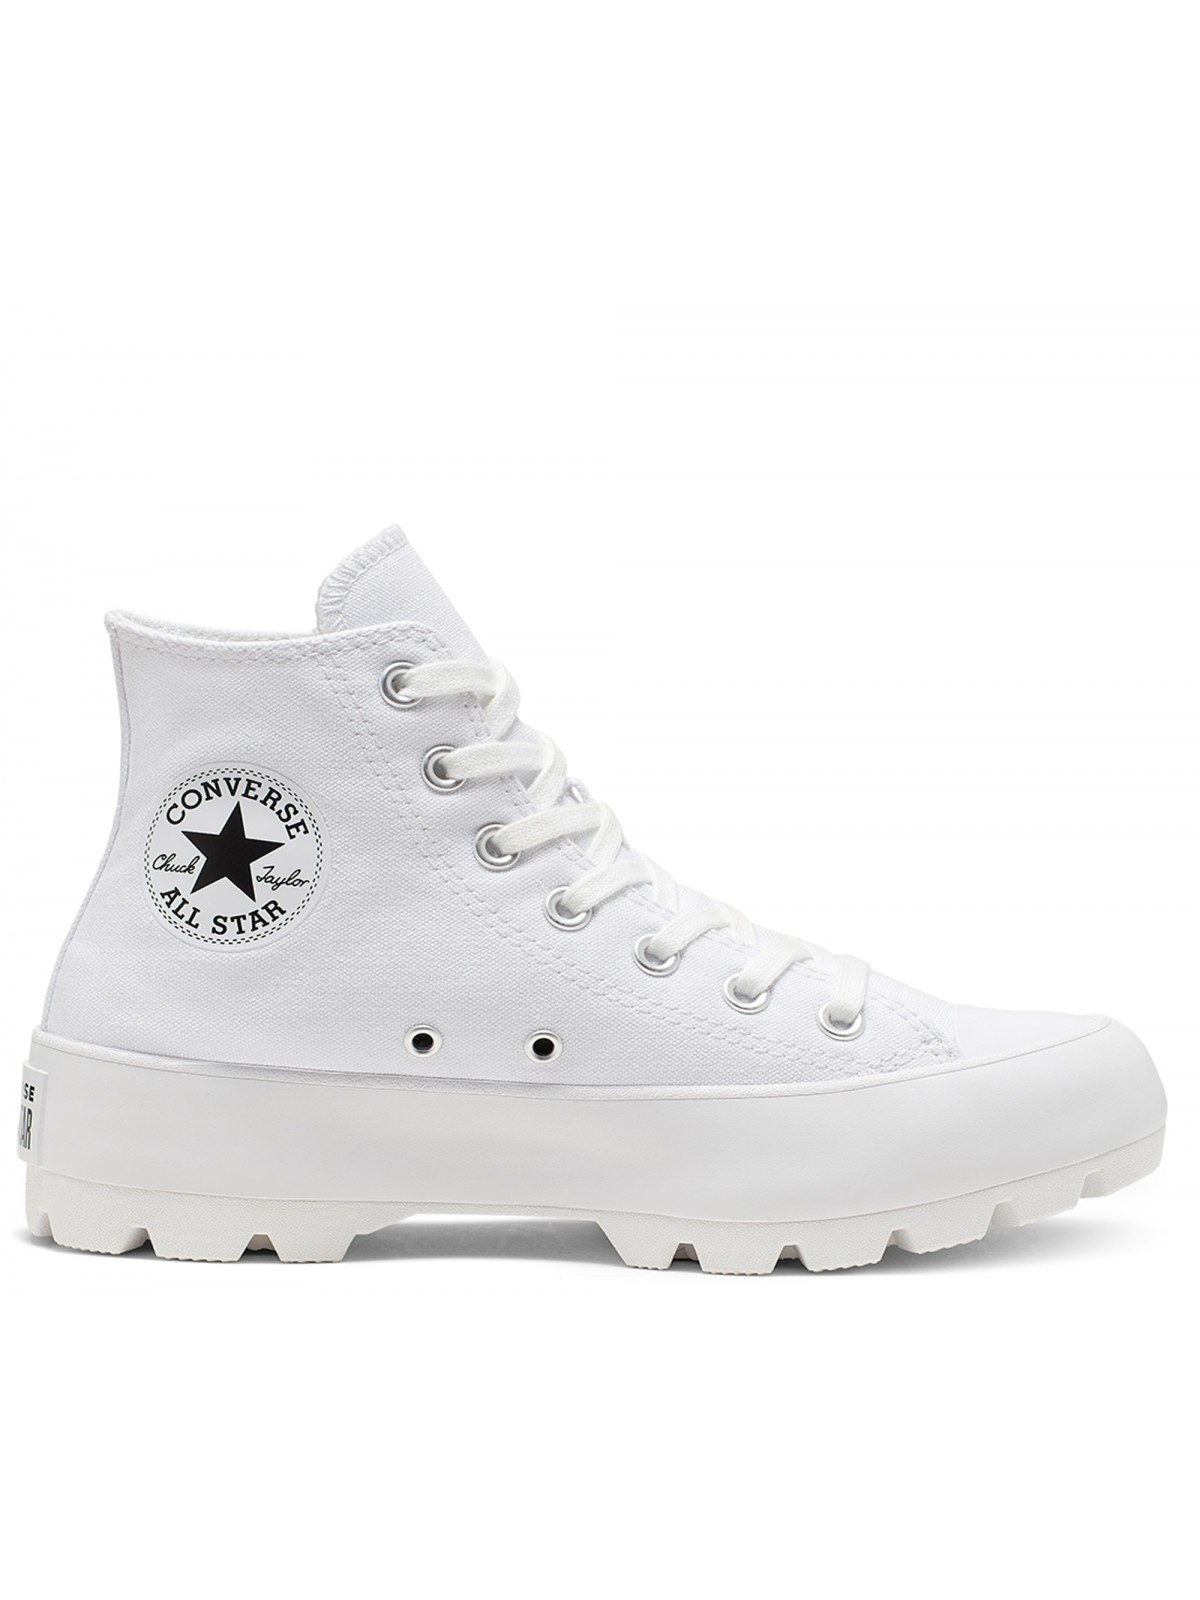 Converse Chuck Taylor all star Lugged blanc (plateform )